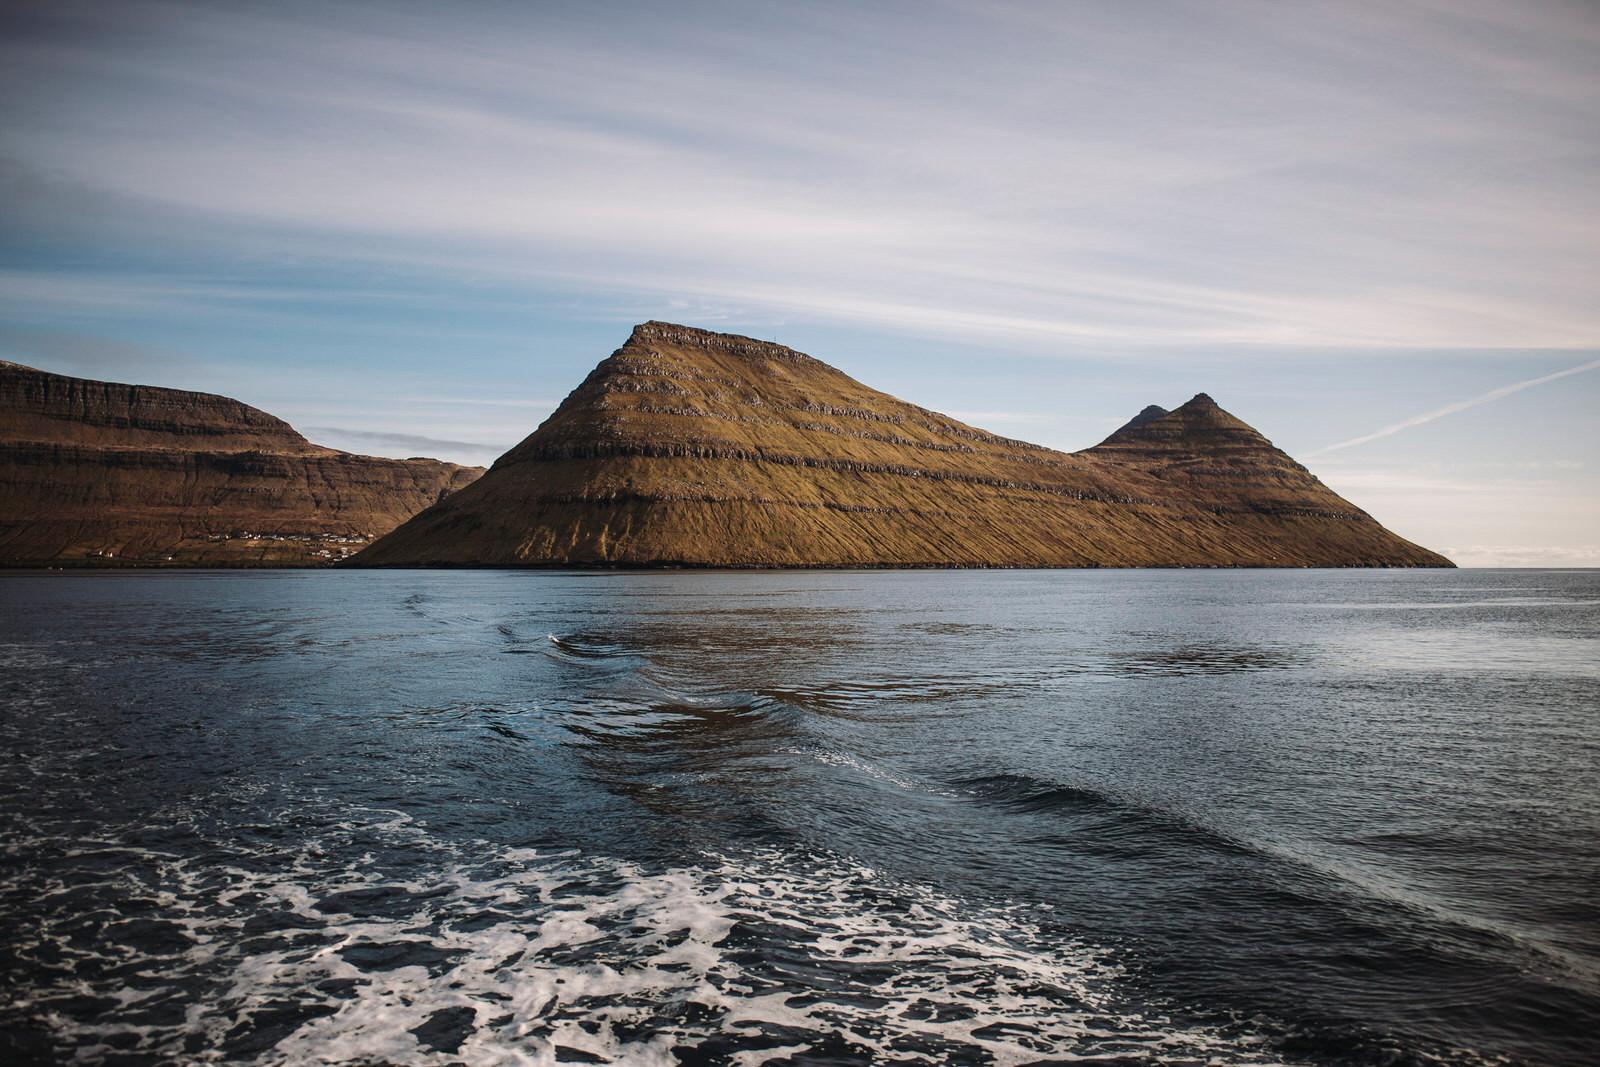 viaggio isole faroe_18.jpg